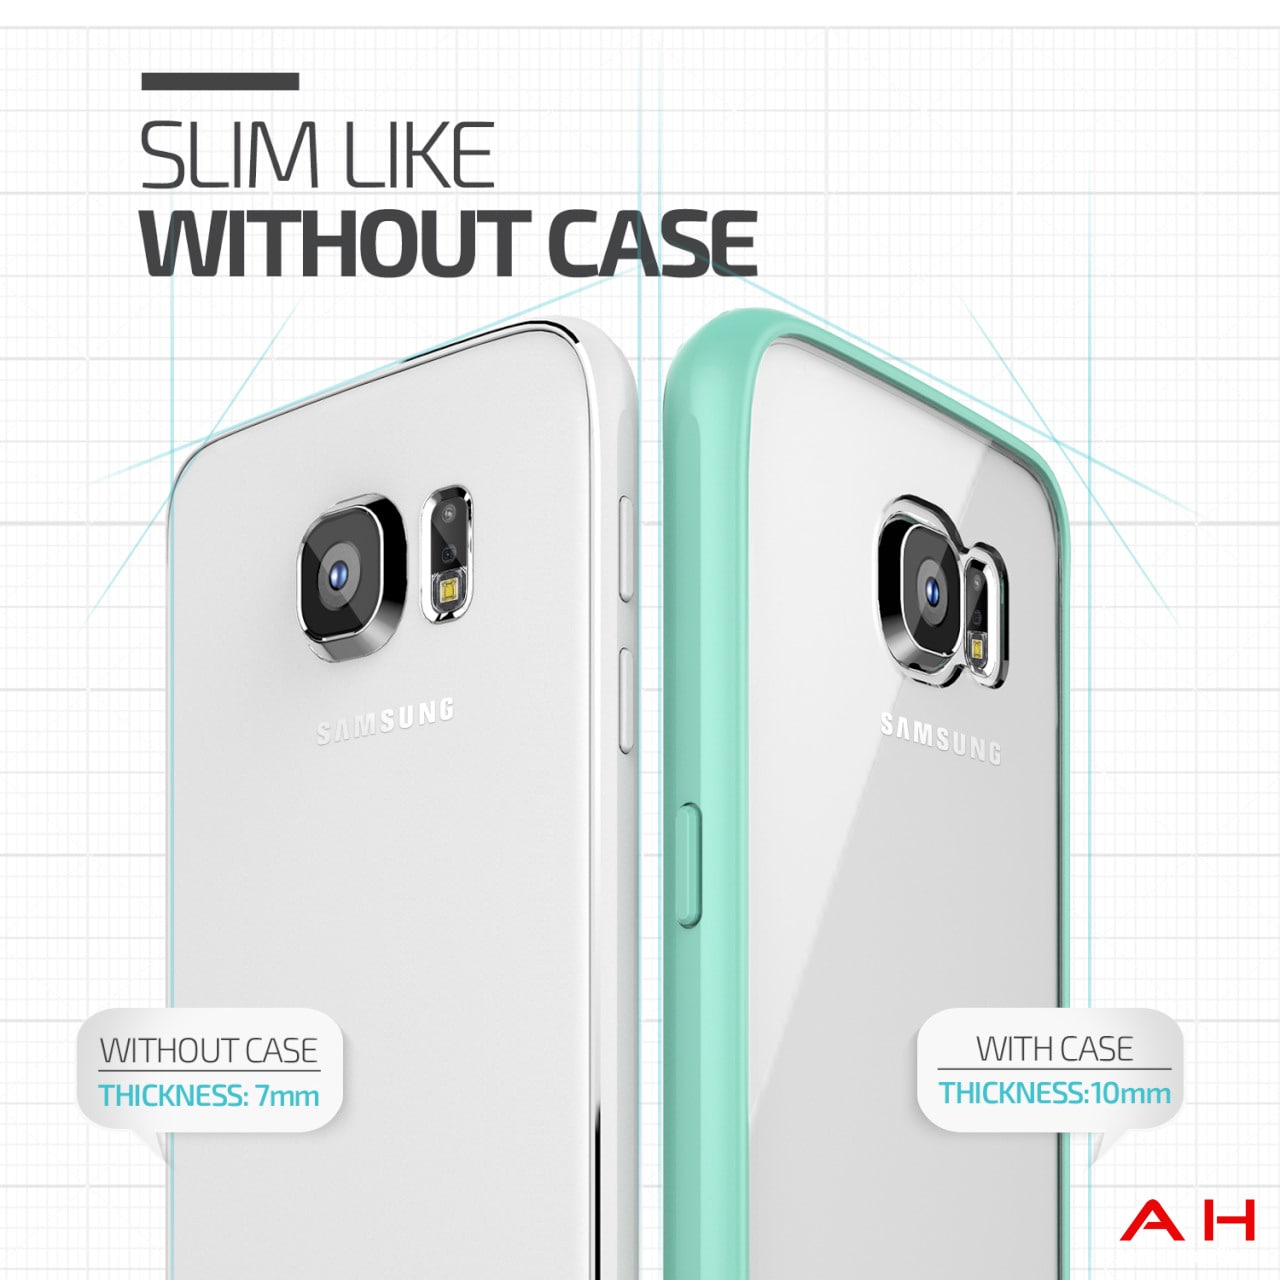 Galaxy S6 leaked custodie trasparenti – 1